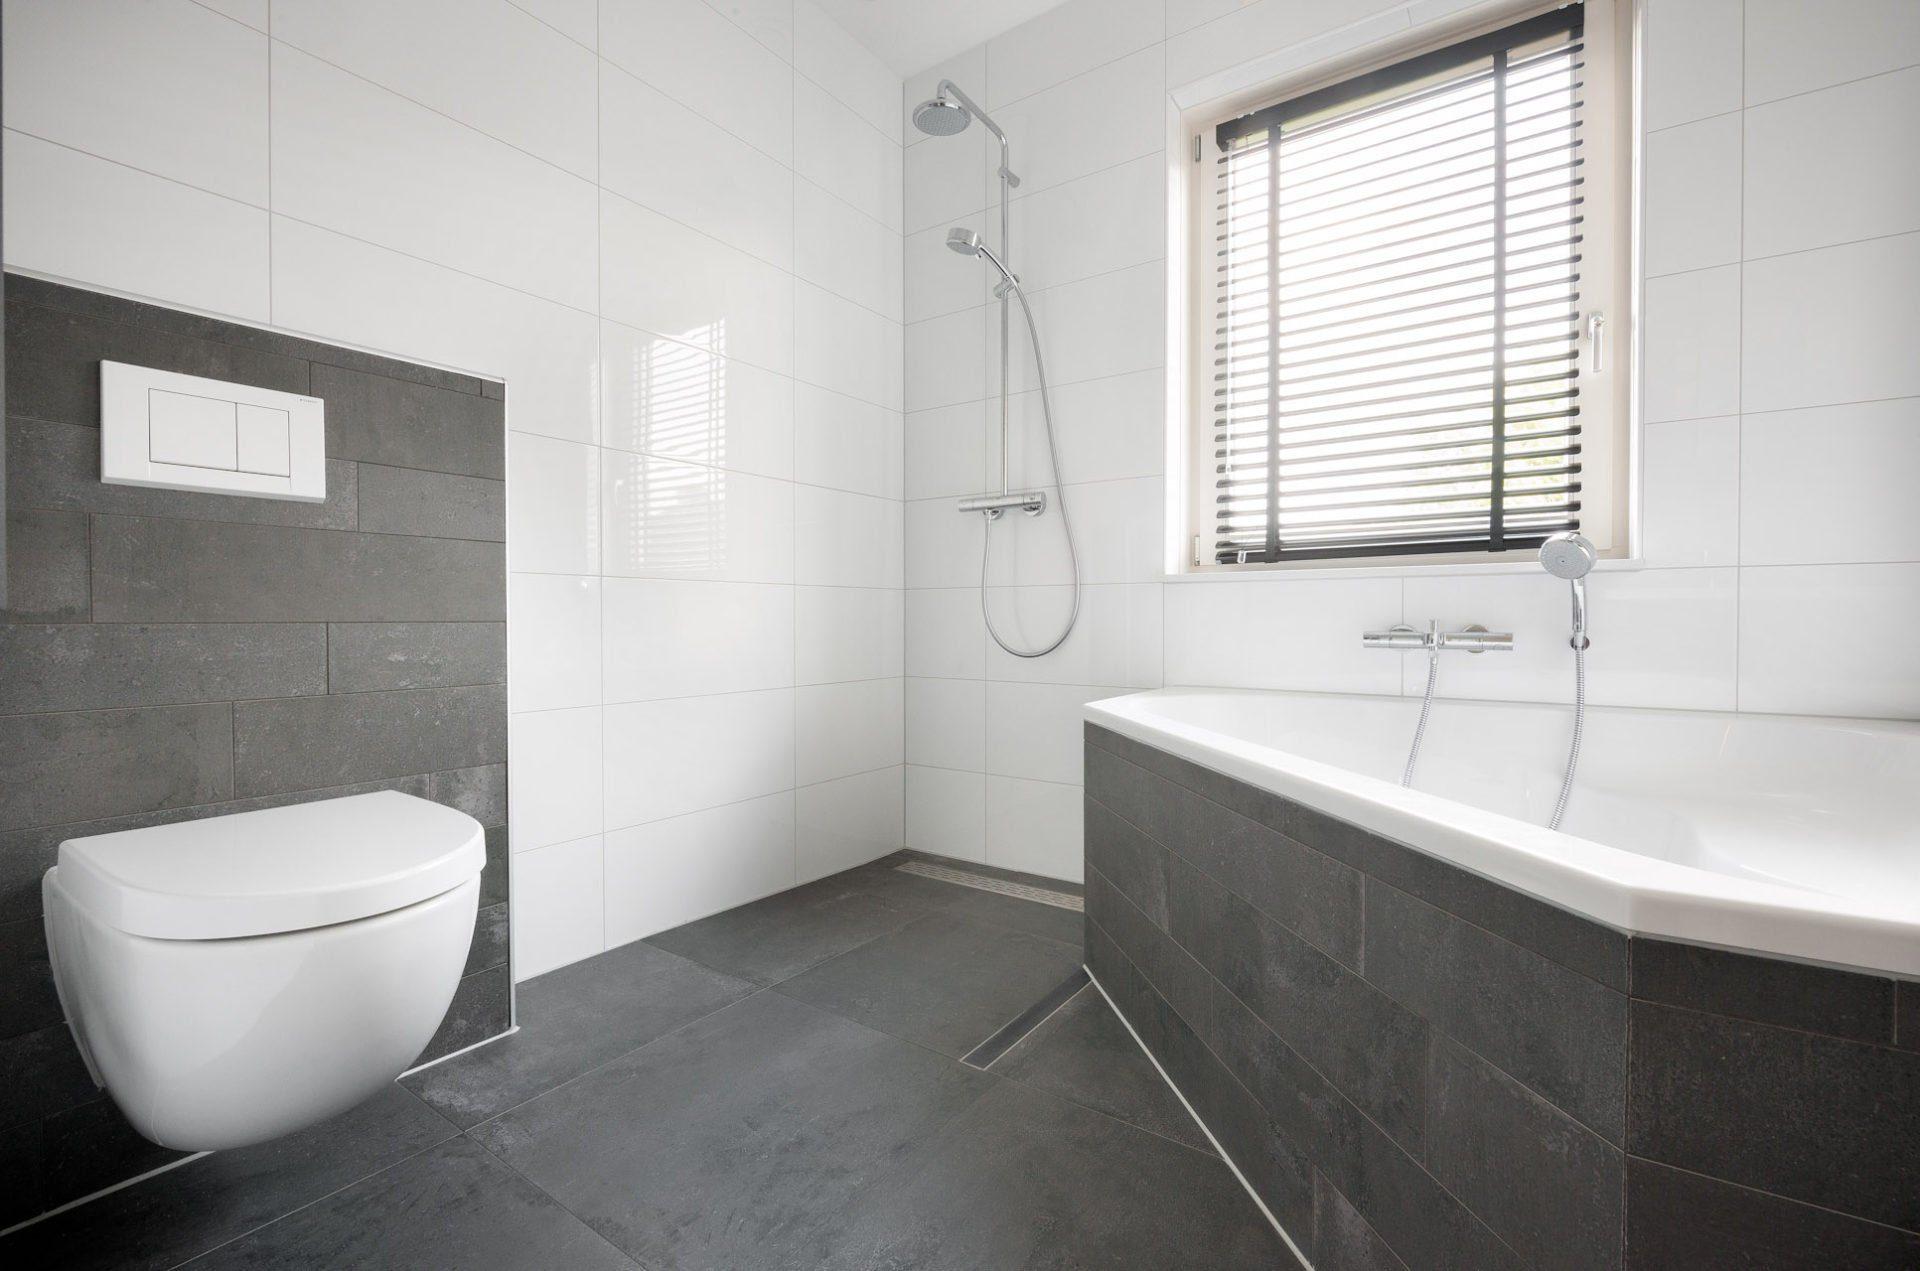 ikea badkamer vlonder fuck for